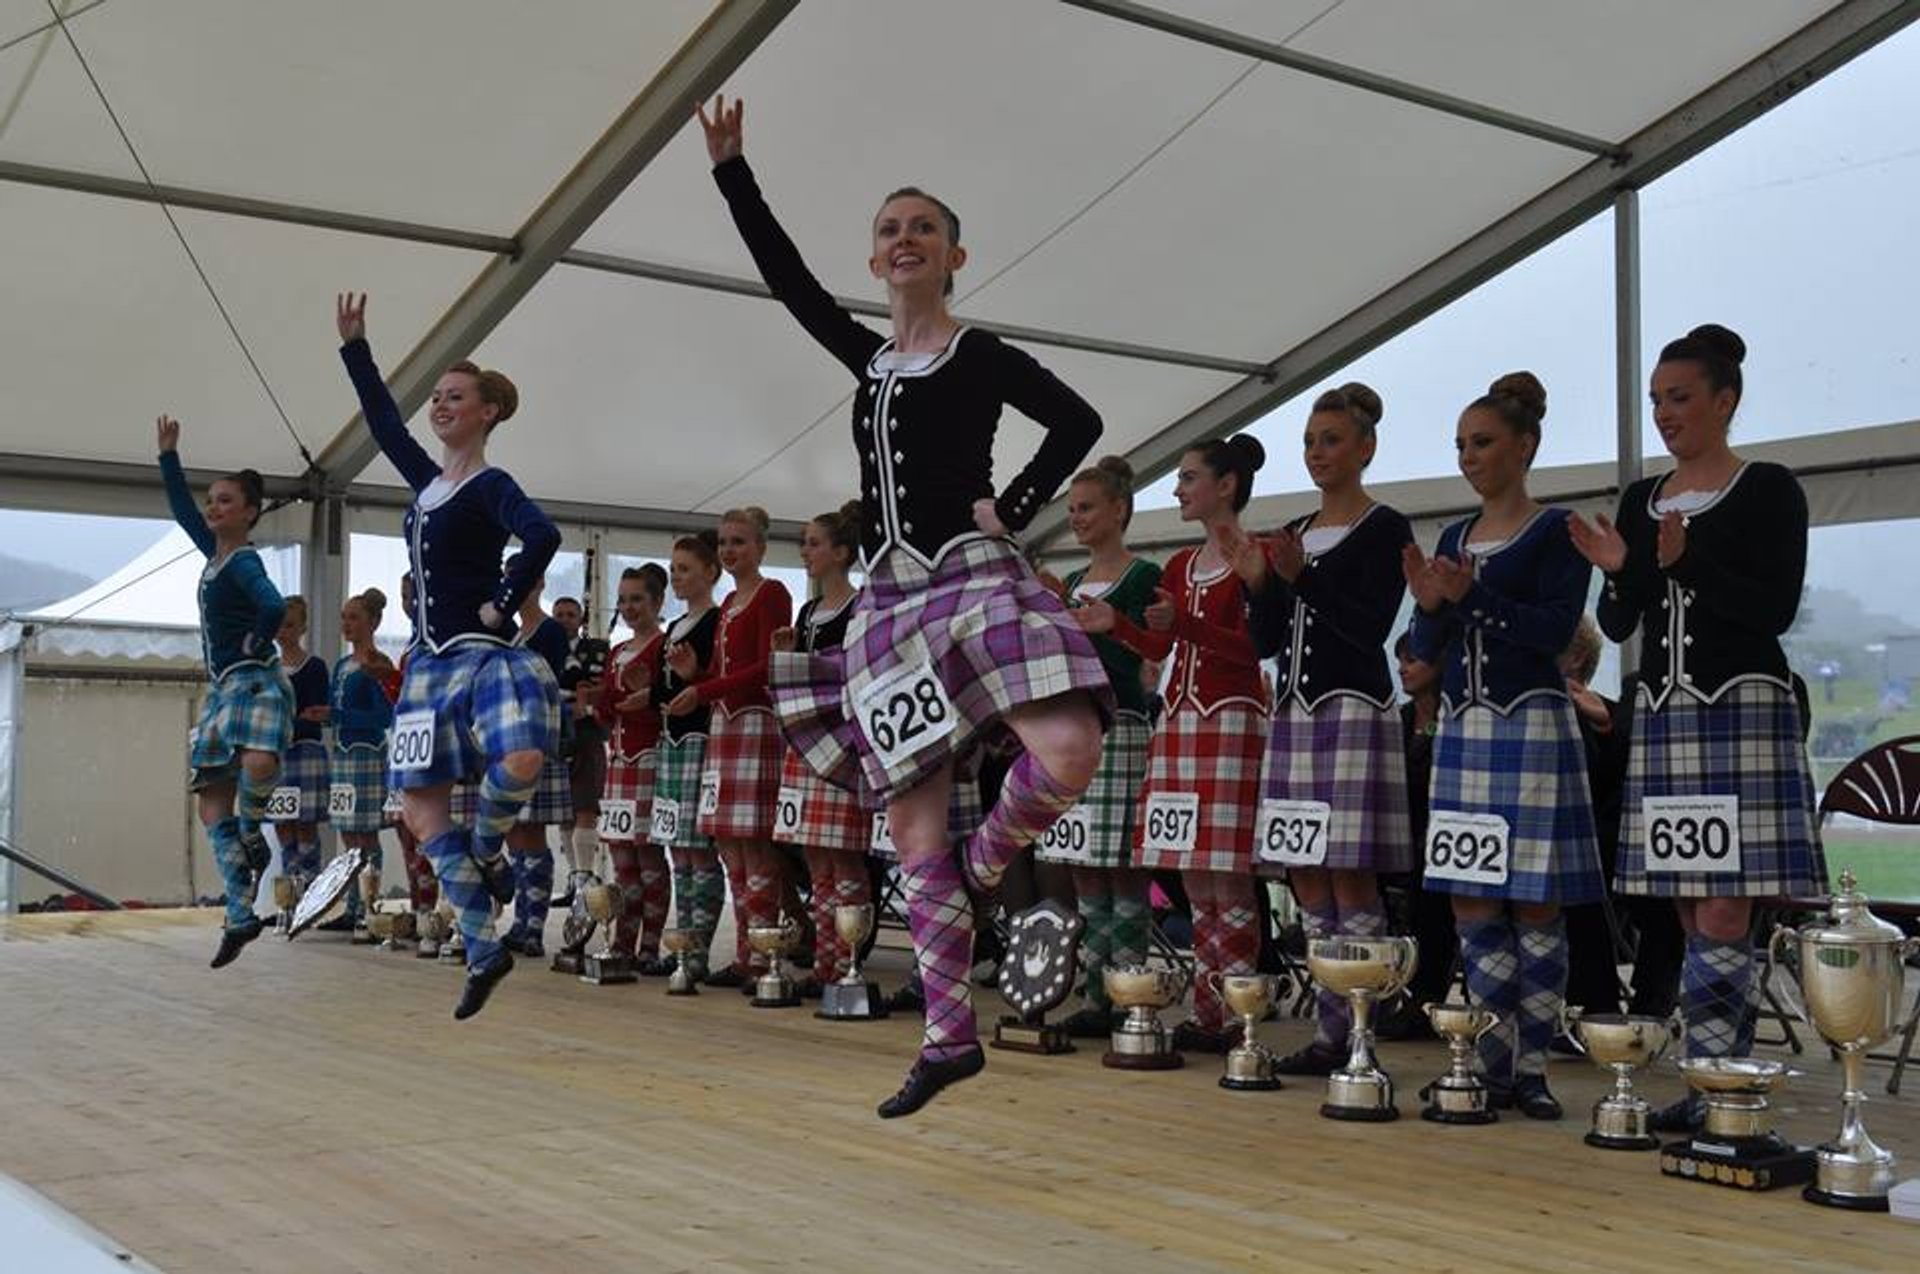 Cowal Highland Gathering in Scotland - Best Season 2020